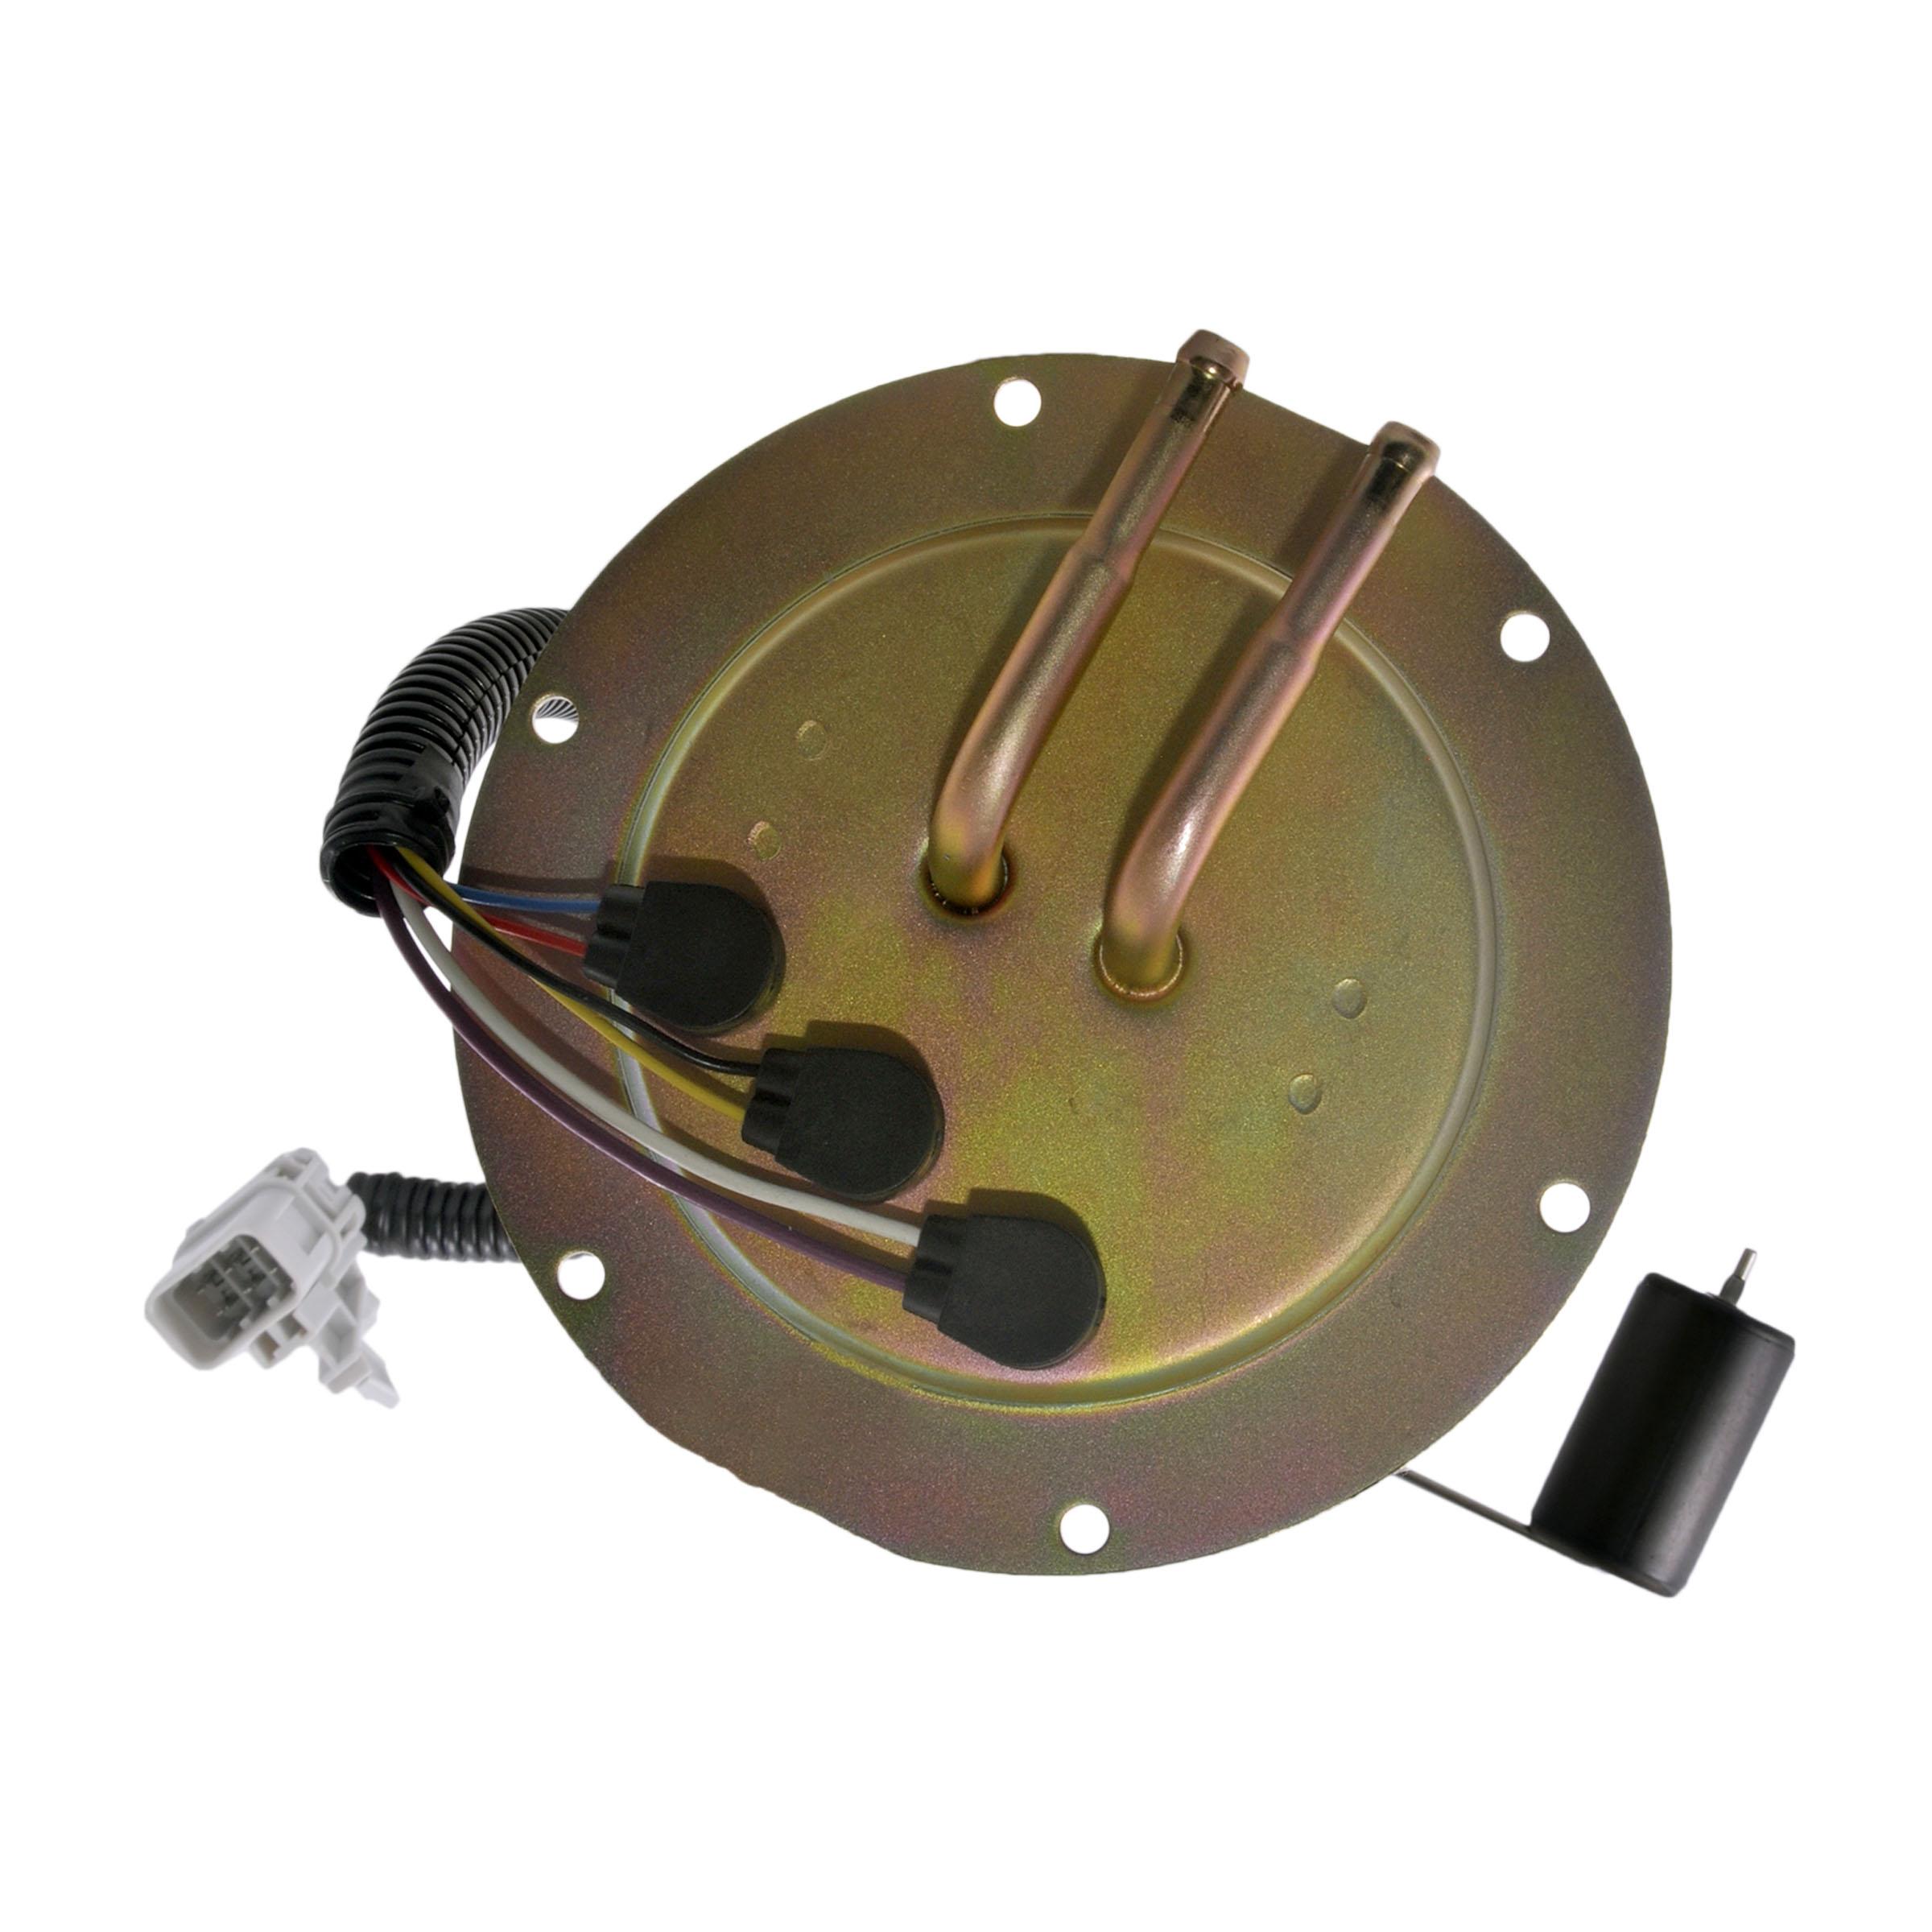 s13 240sx fuel pump wiring diagram hyundai atos ecu 91 1990 nissan fuse